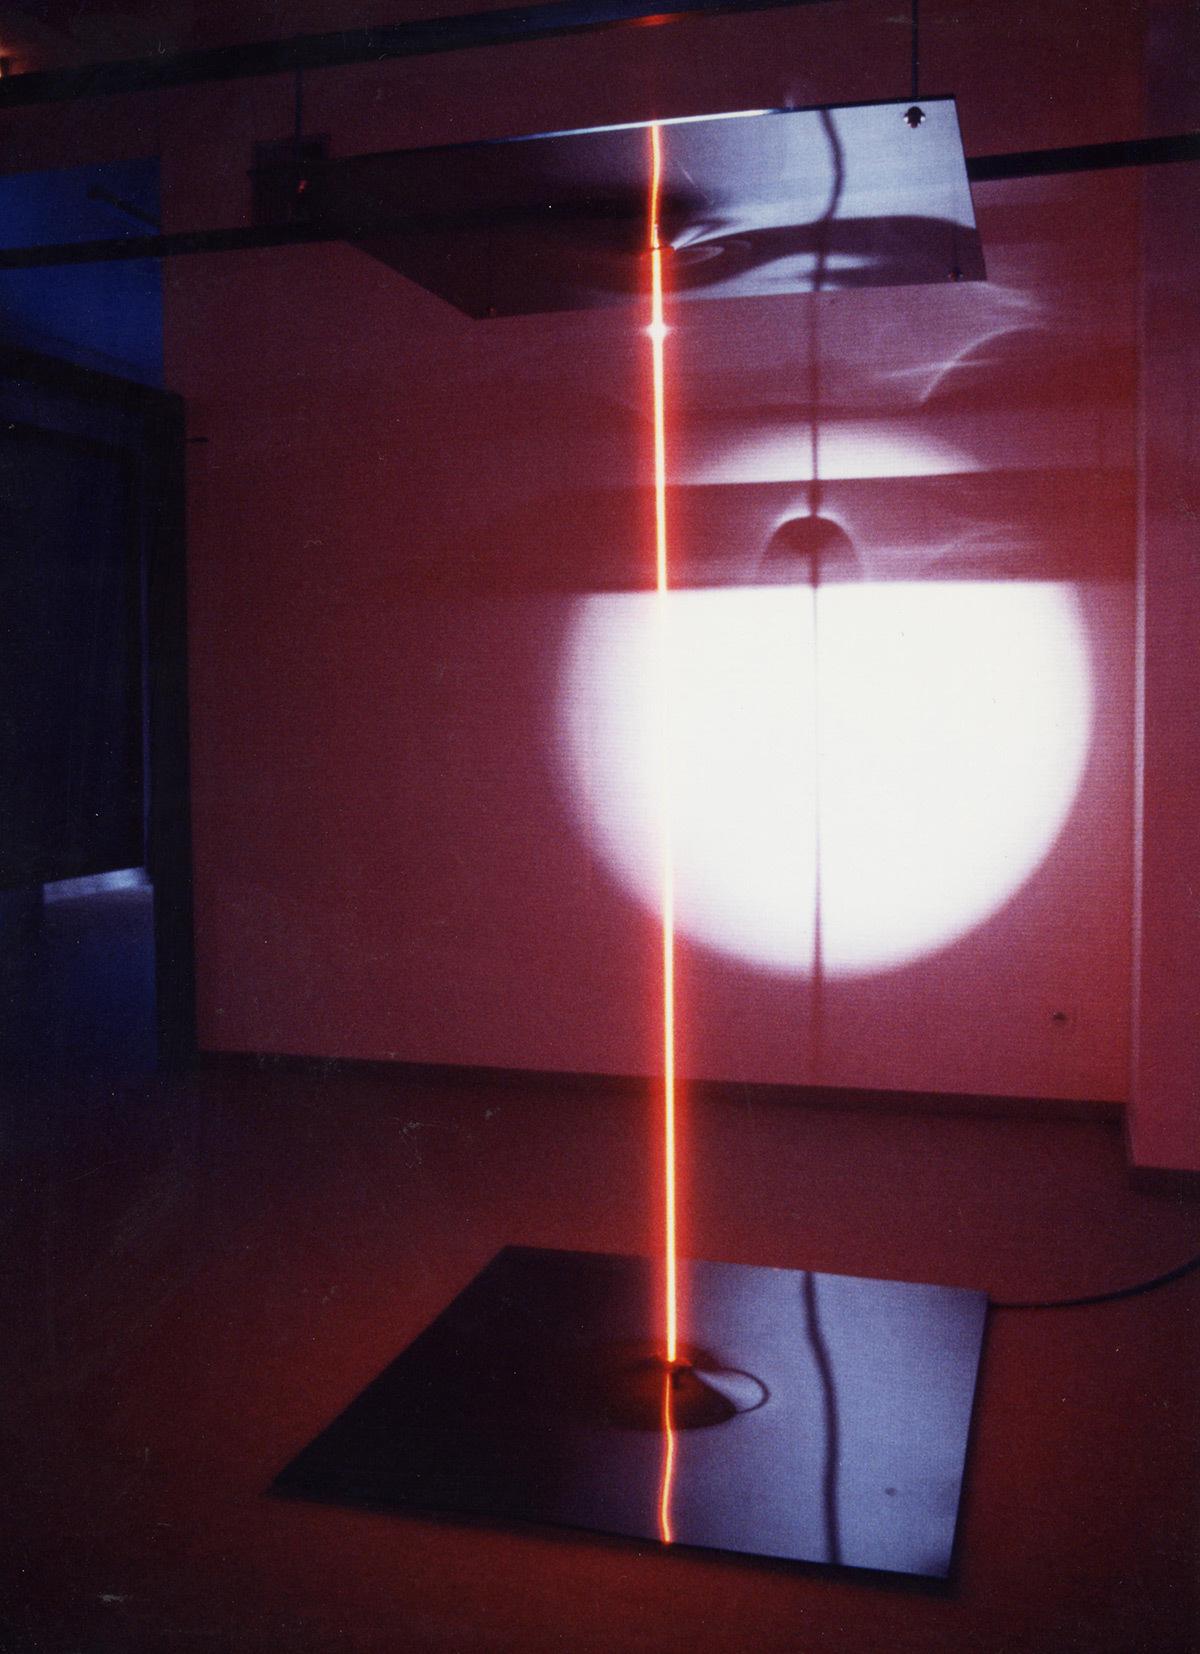 la lumi re sera nanoscopique roger narboni light zoom lumi re le portail de la lumi re. Black Bedroom Furniture Sets. Home Design Ideas